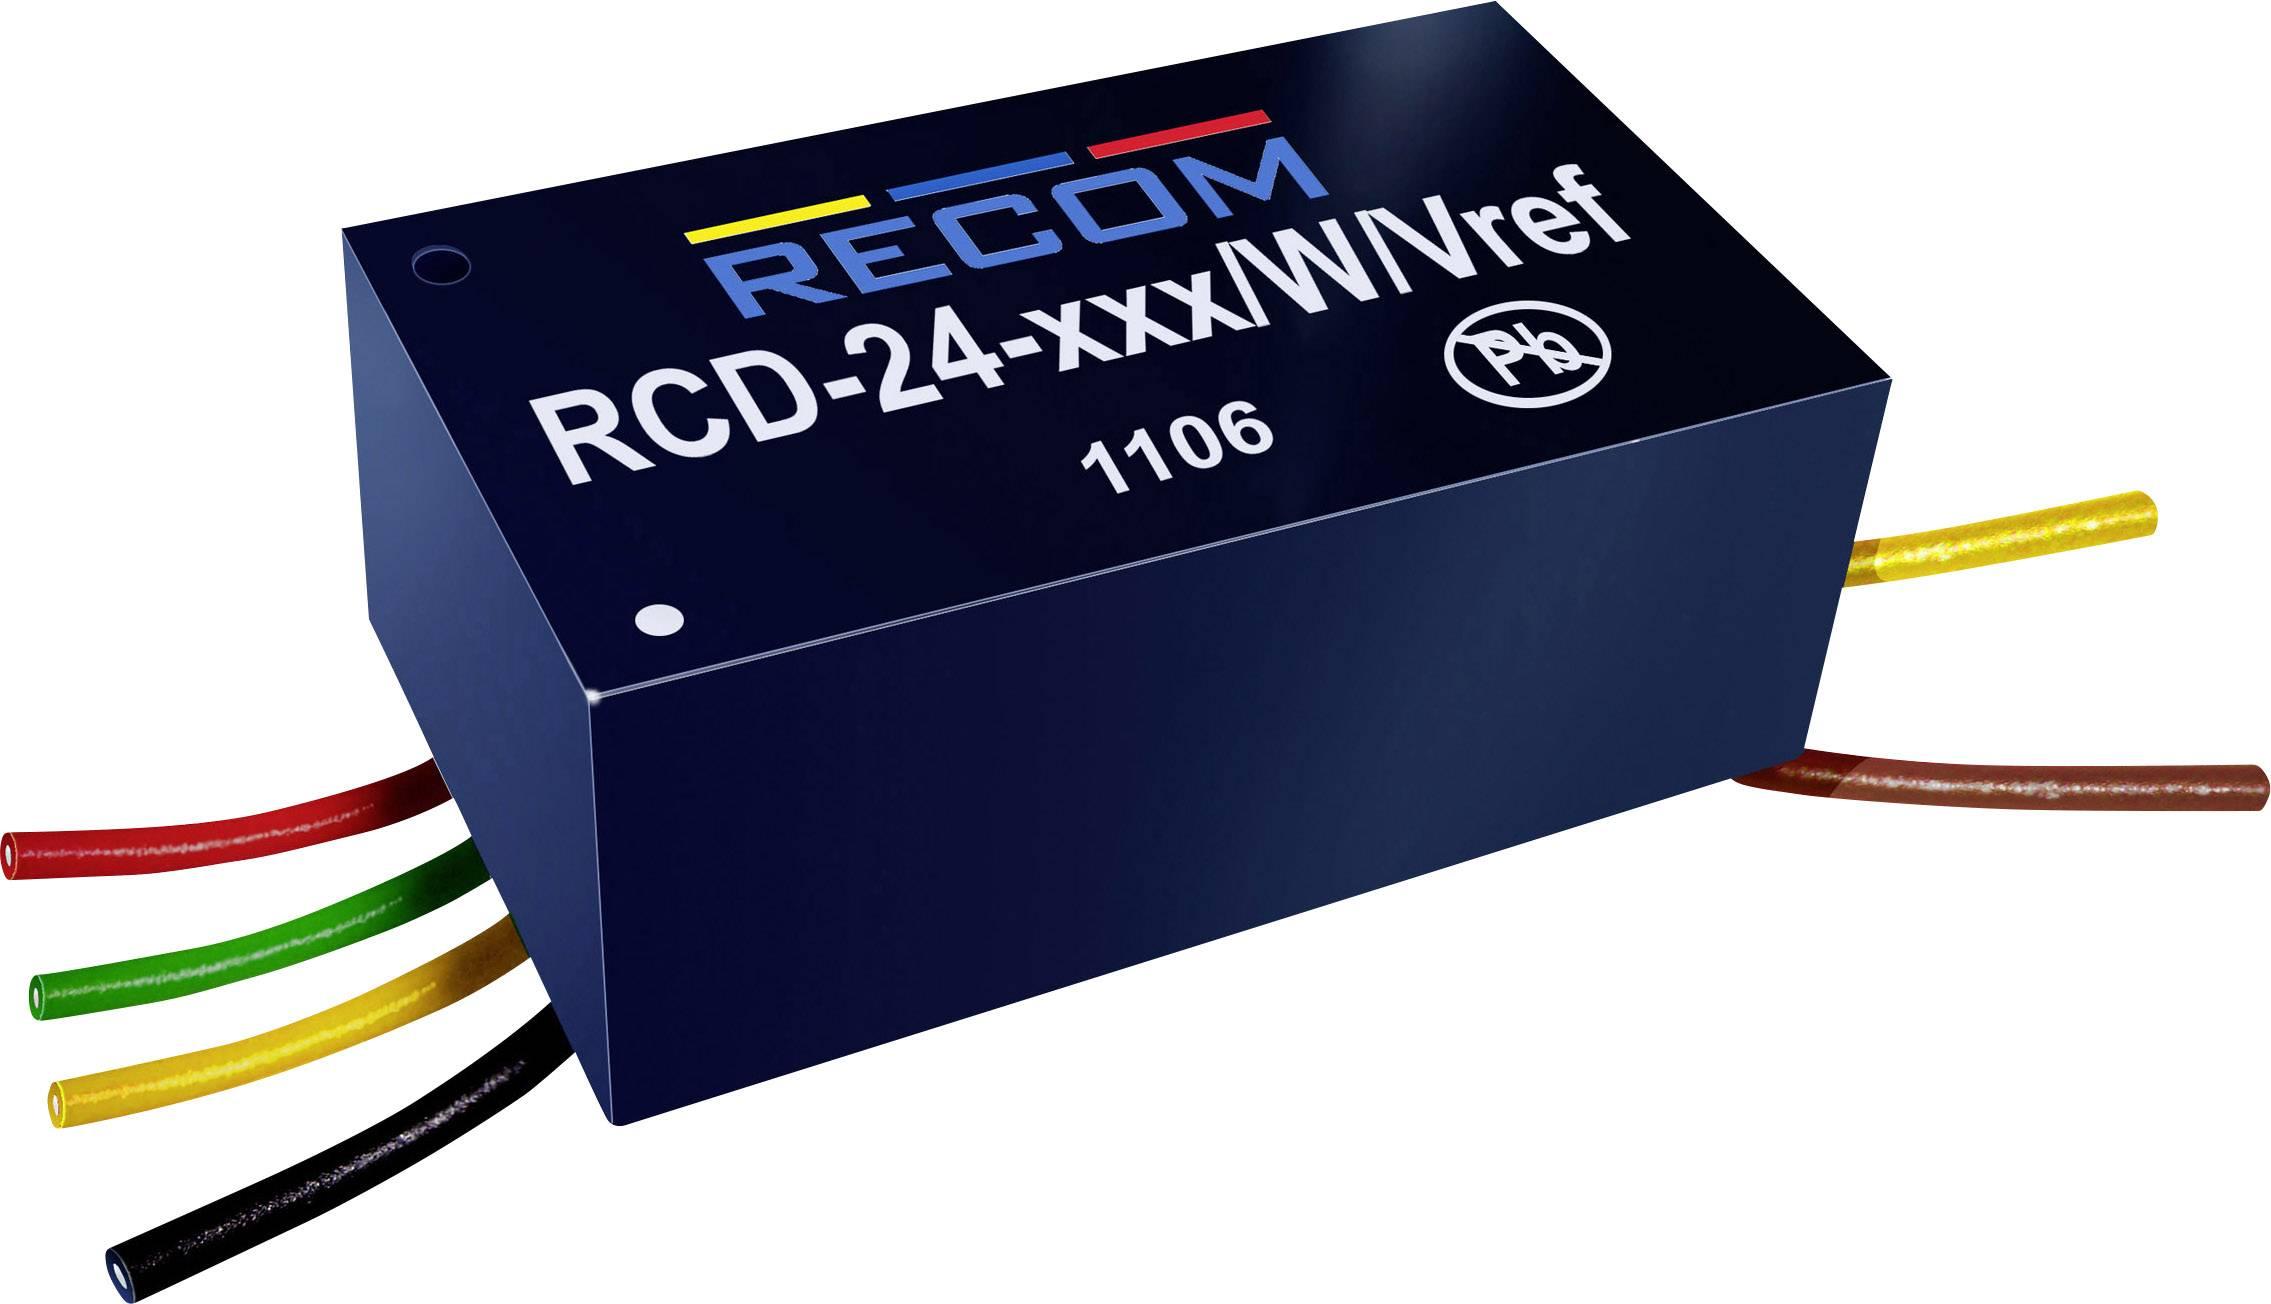 LED driver Recom Lighting RCD-24-0.70/W, 4,5-36 V/DC